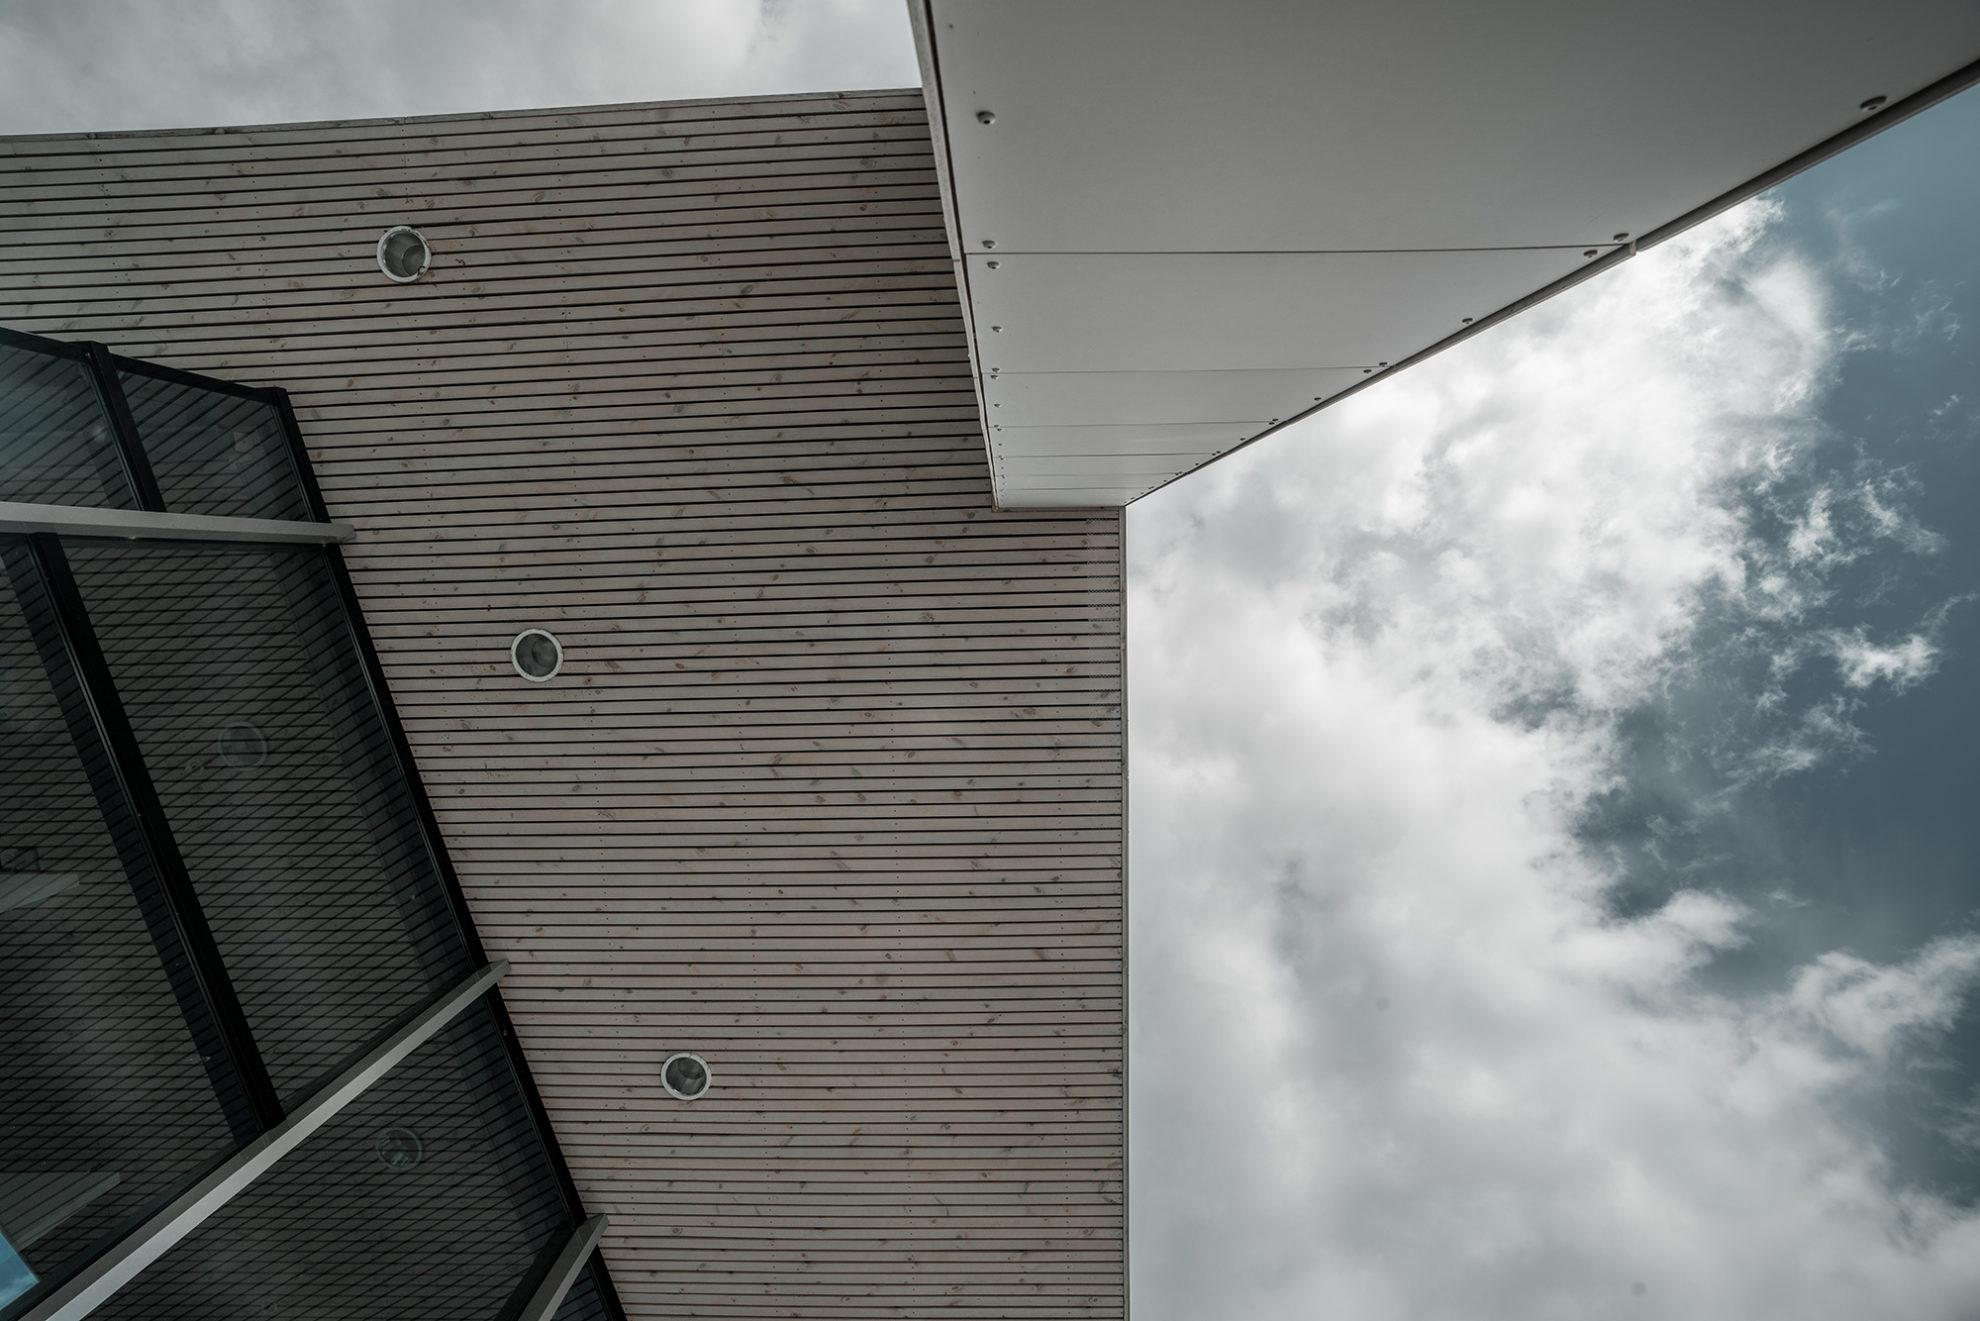 sør arkitekter arkitektkontor telemark